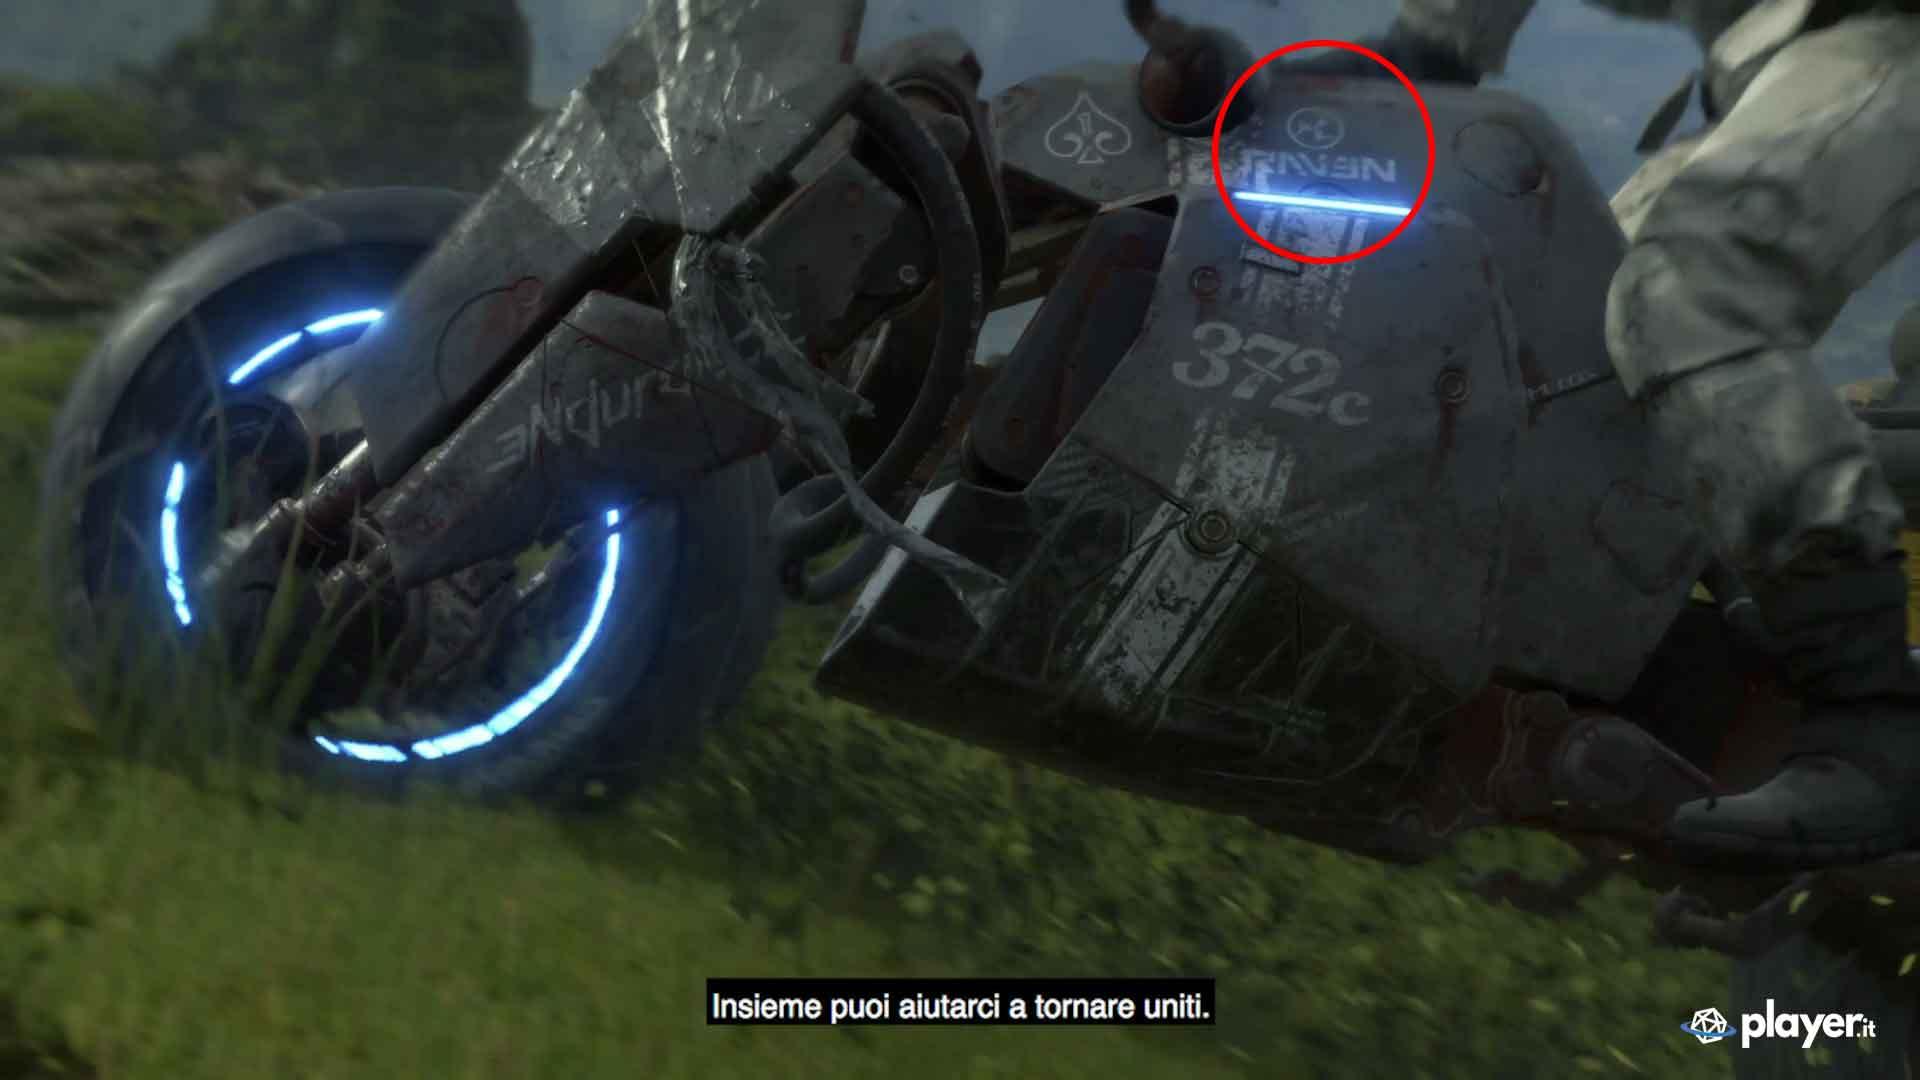 Analisi-trailer-death-stranding-logo-raven-sulla-moto